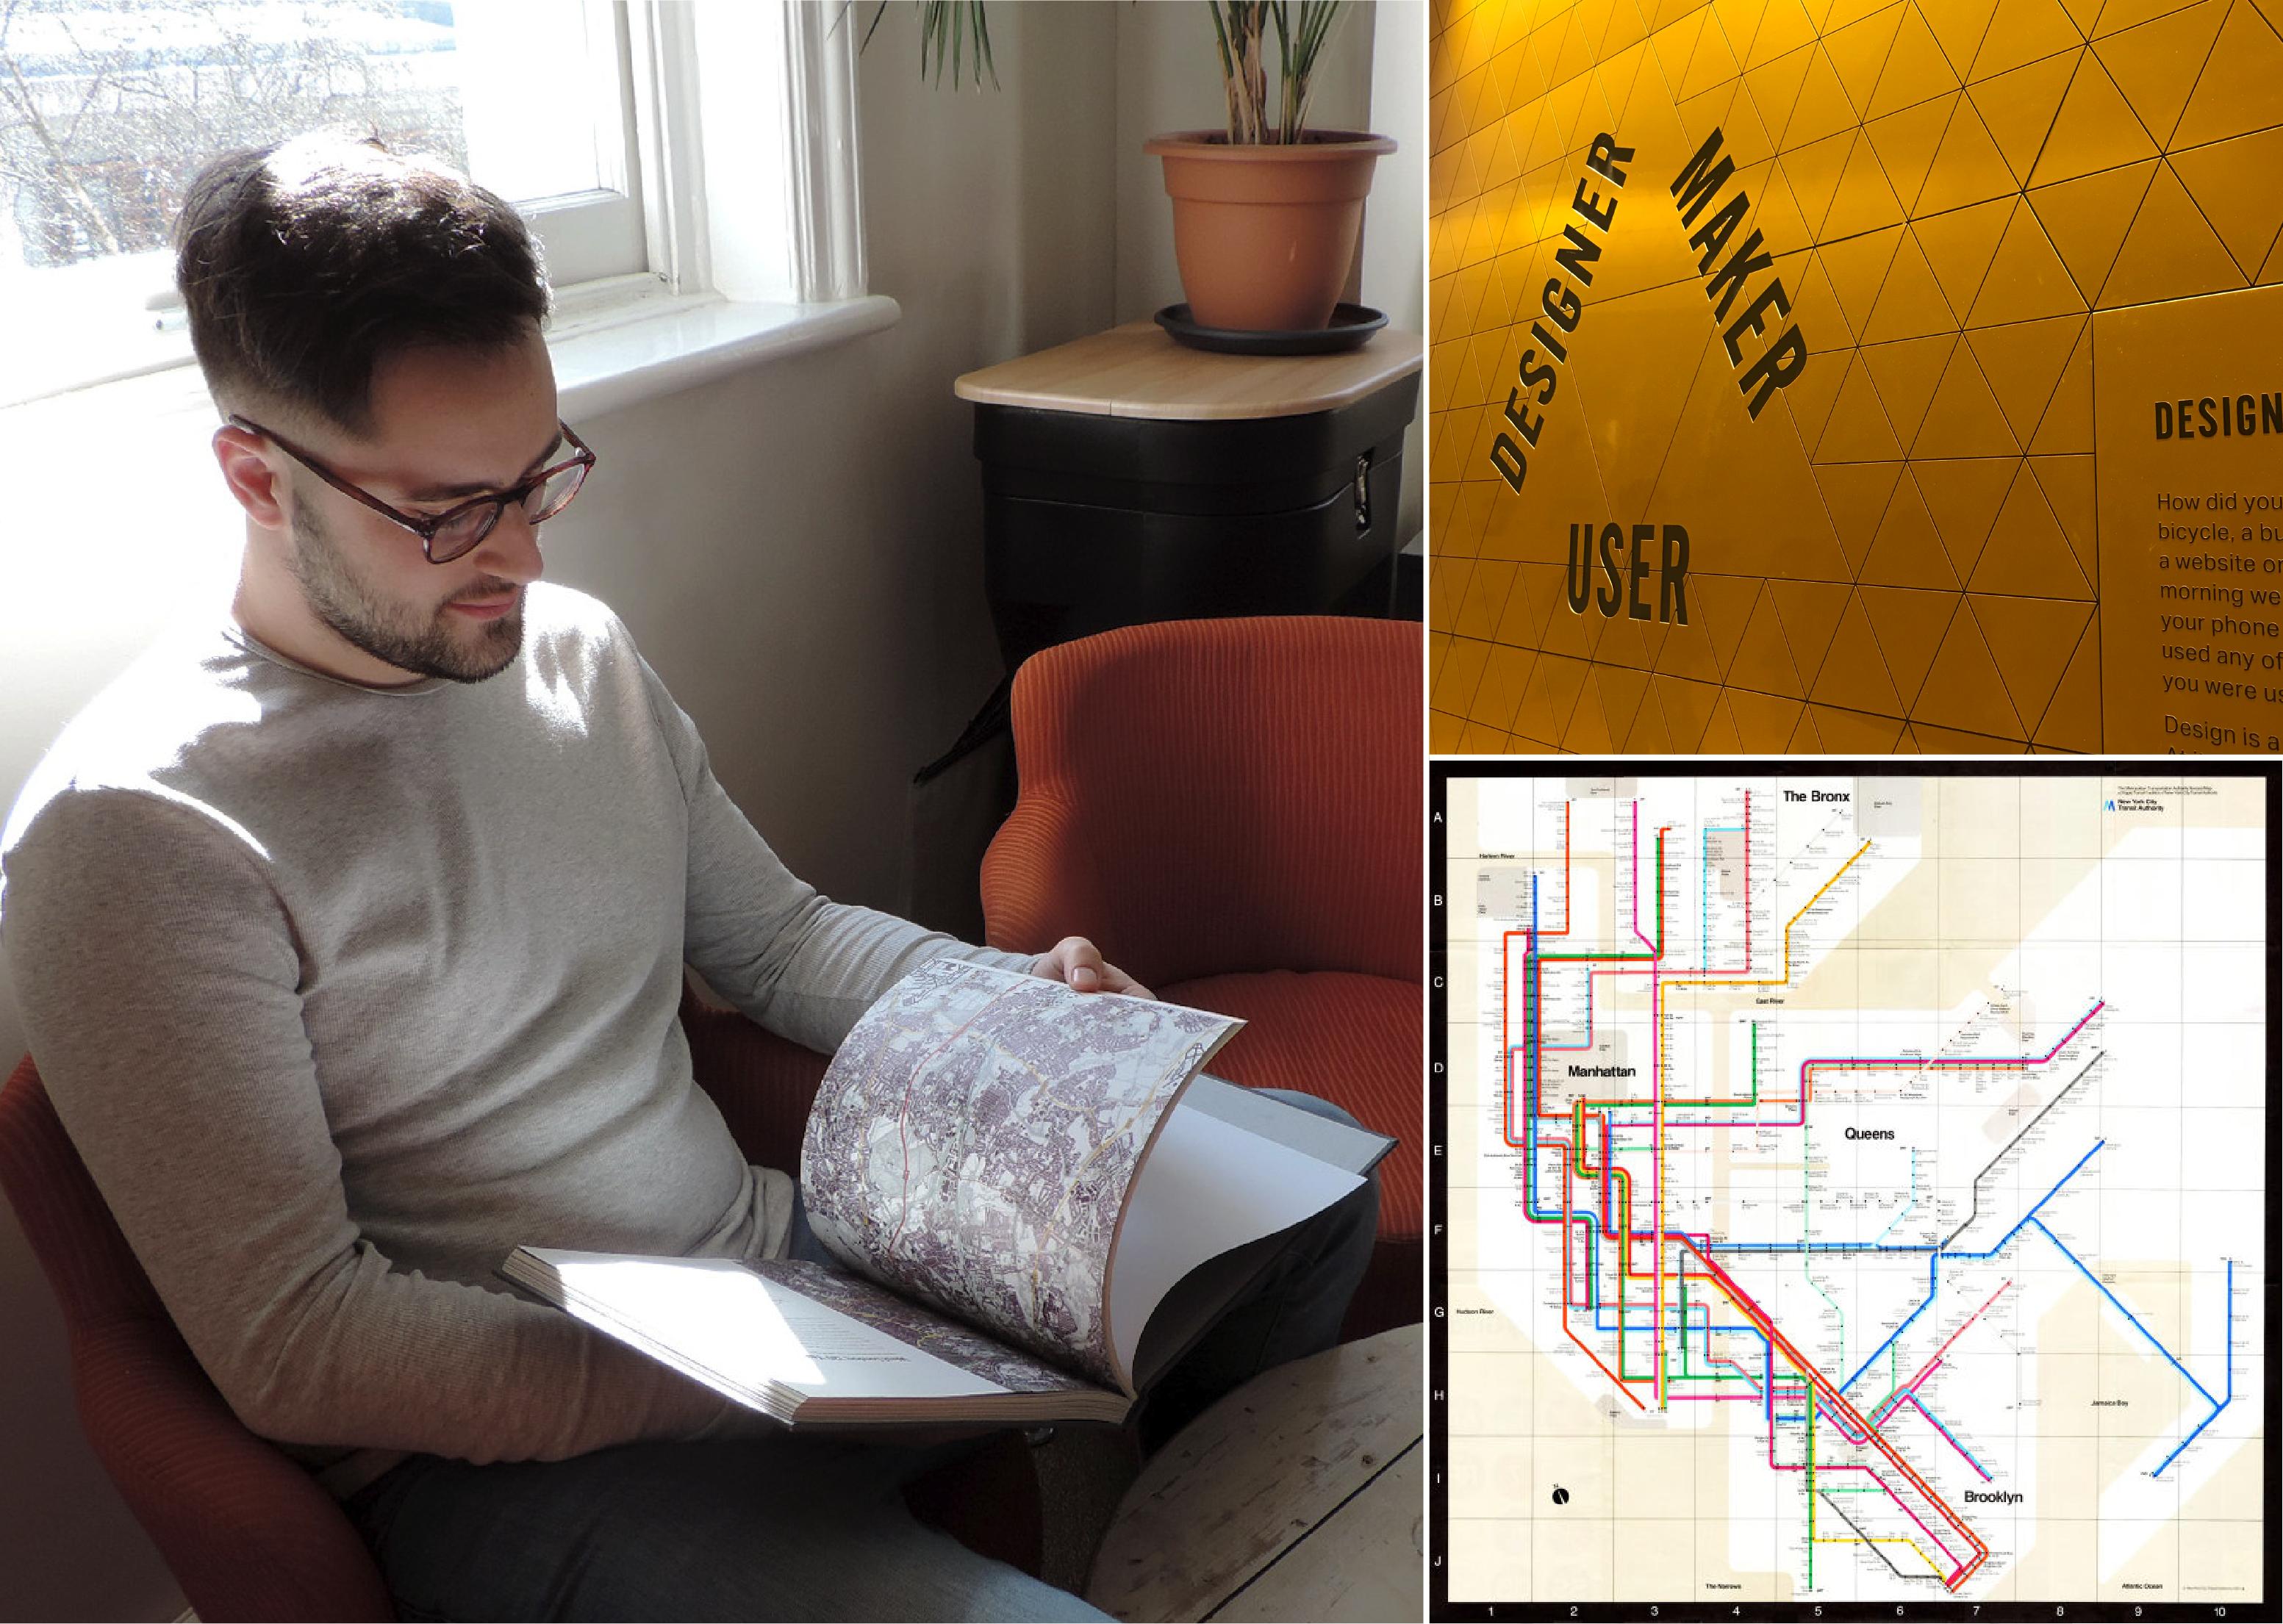 Richard, Design Museum and New York subway map